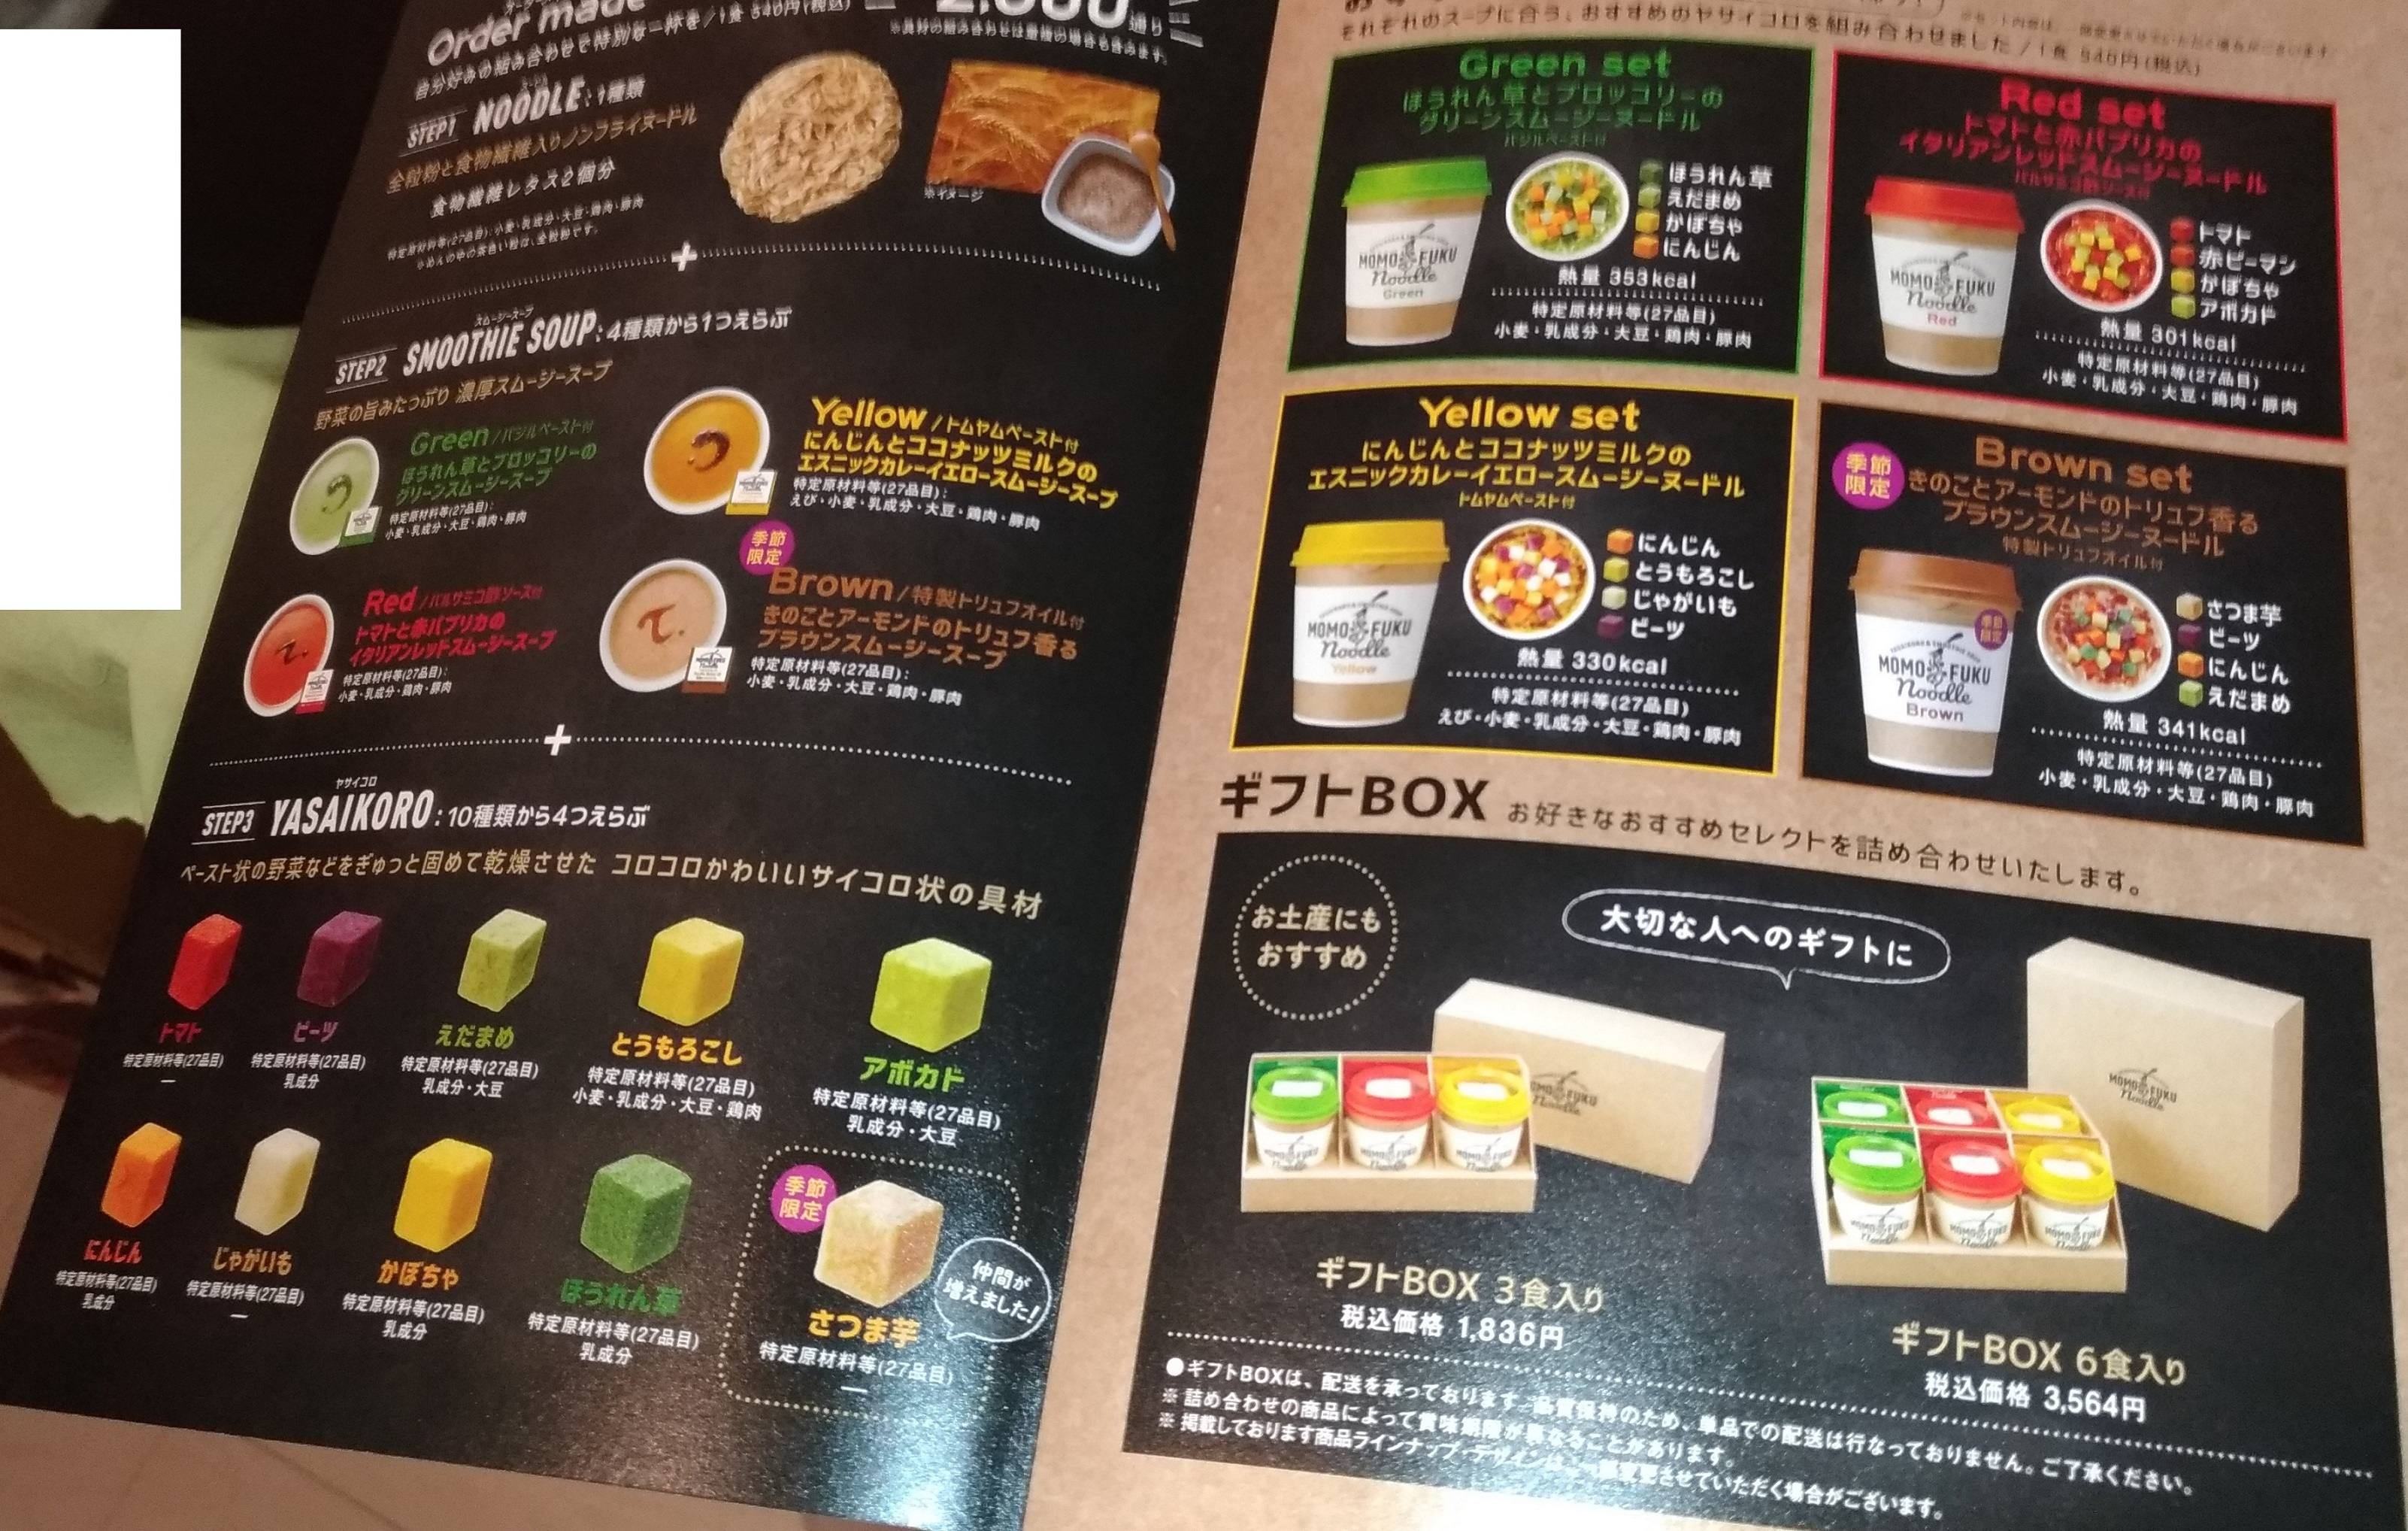 umeda_cup_noodle_hankyu_osaka_4.jpg